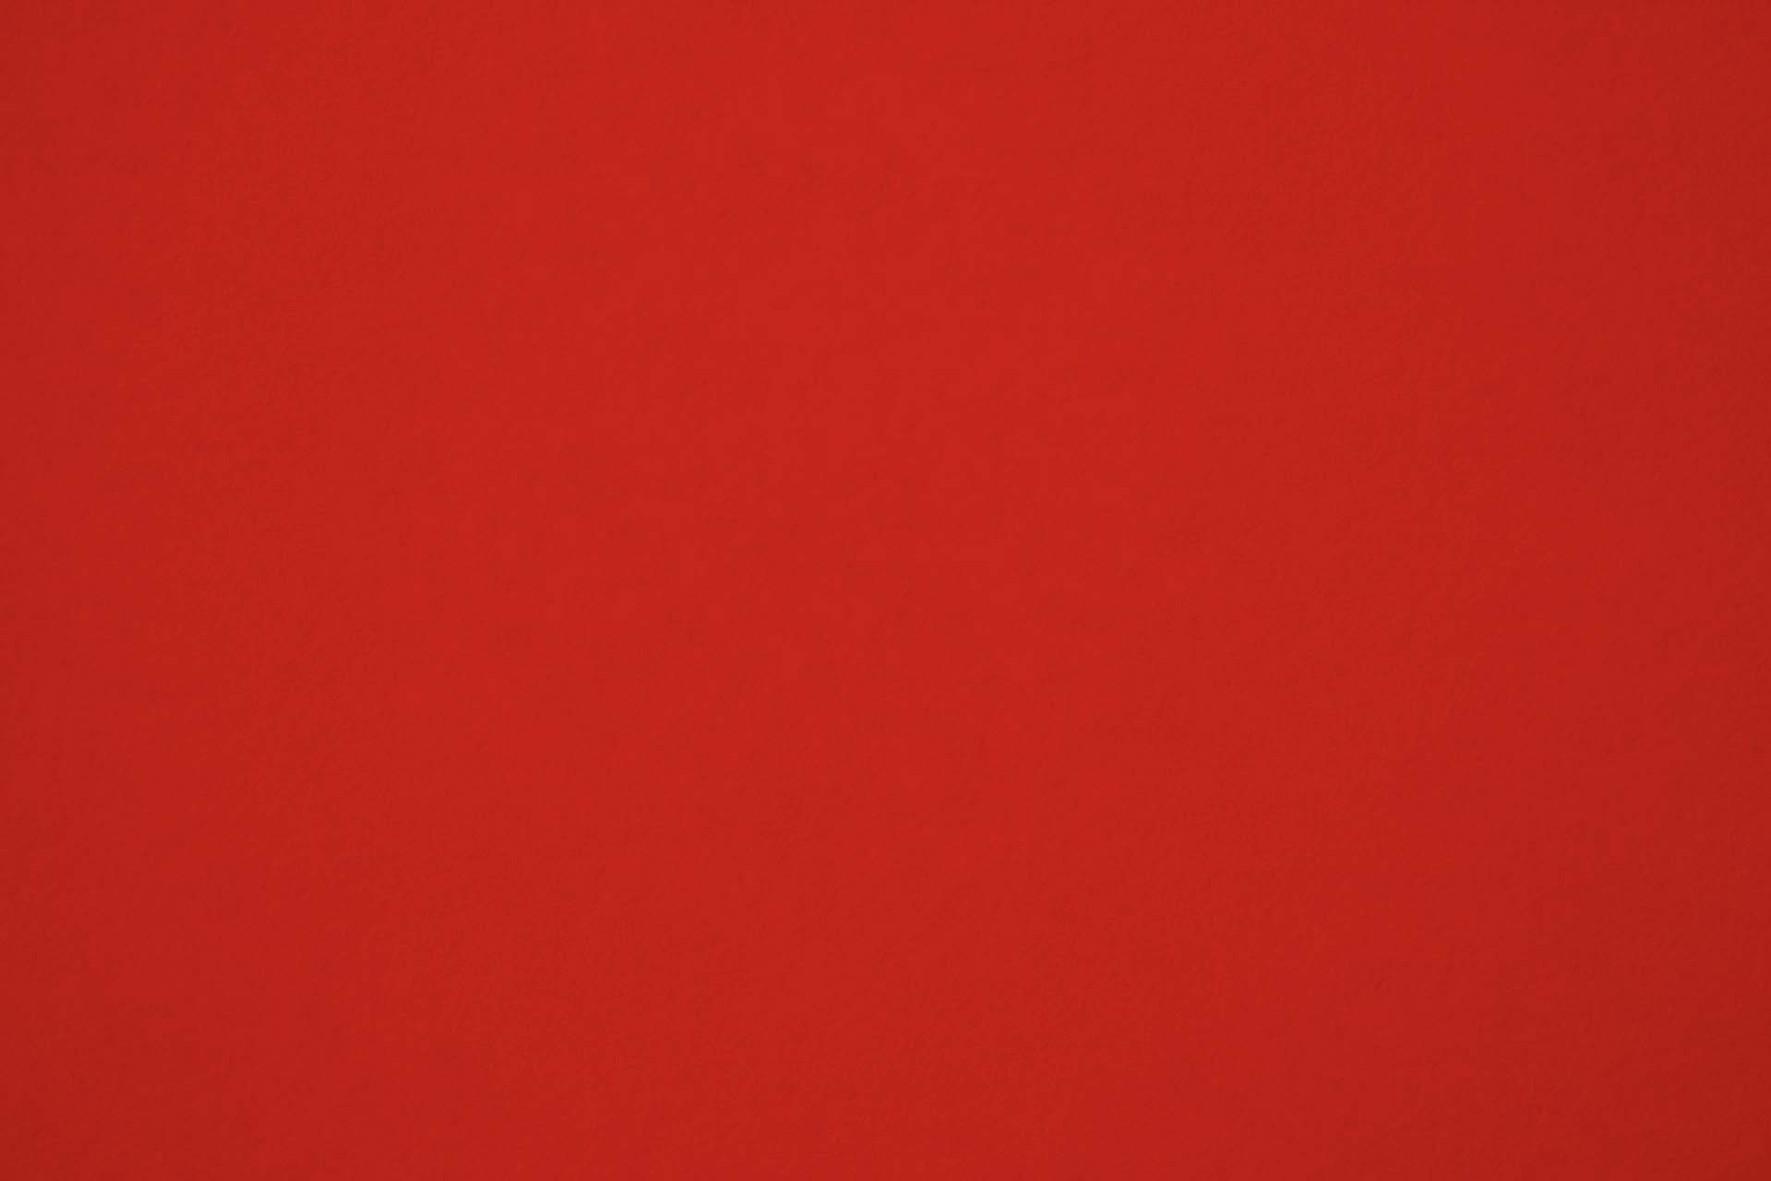 RED_PAPER.jpg